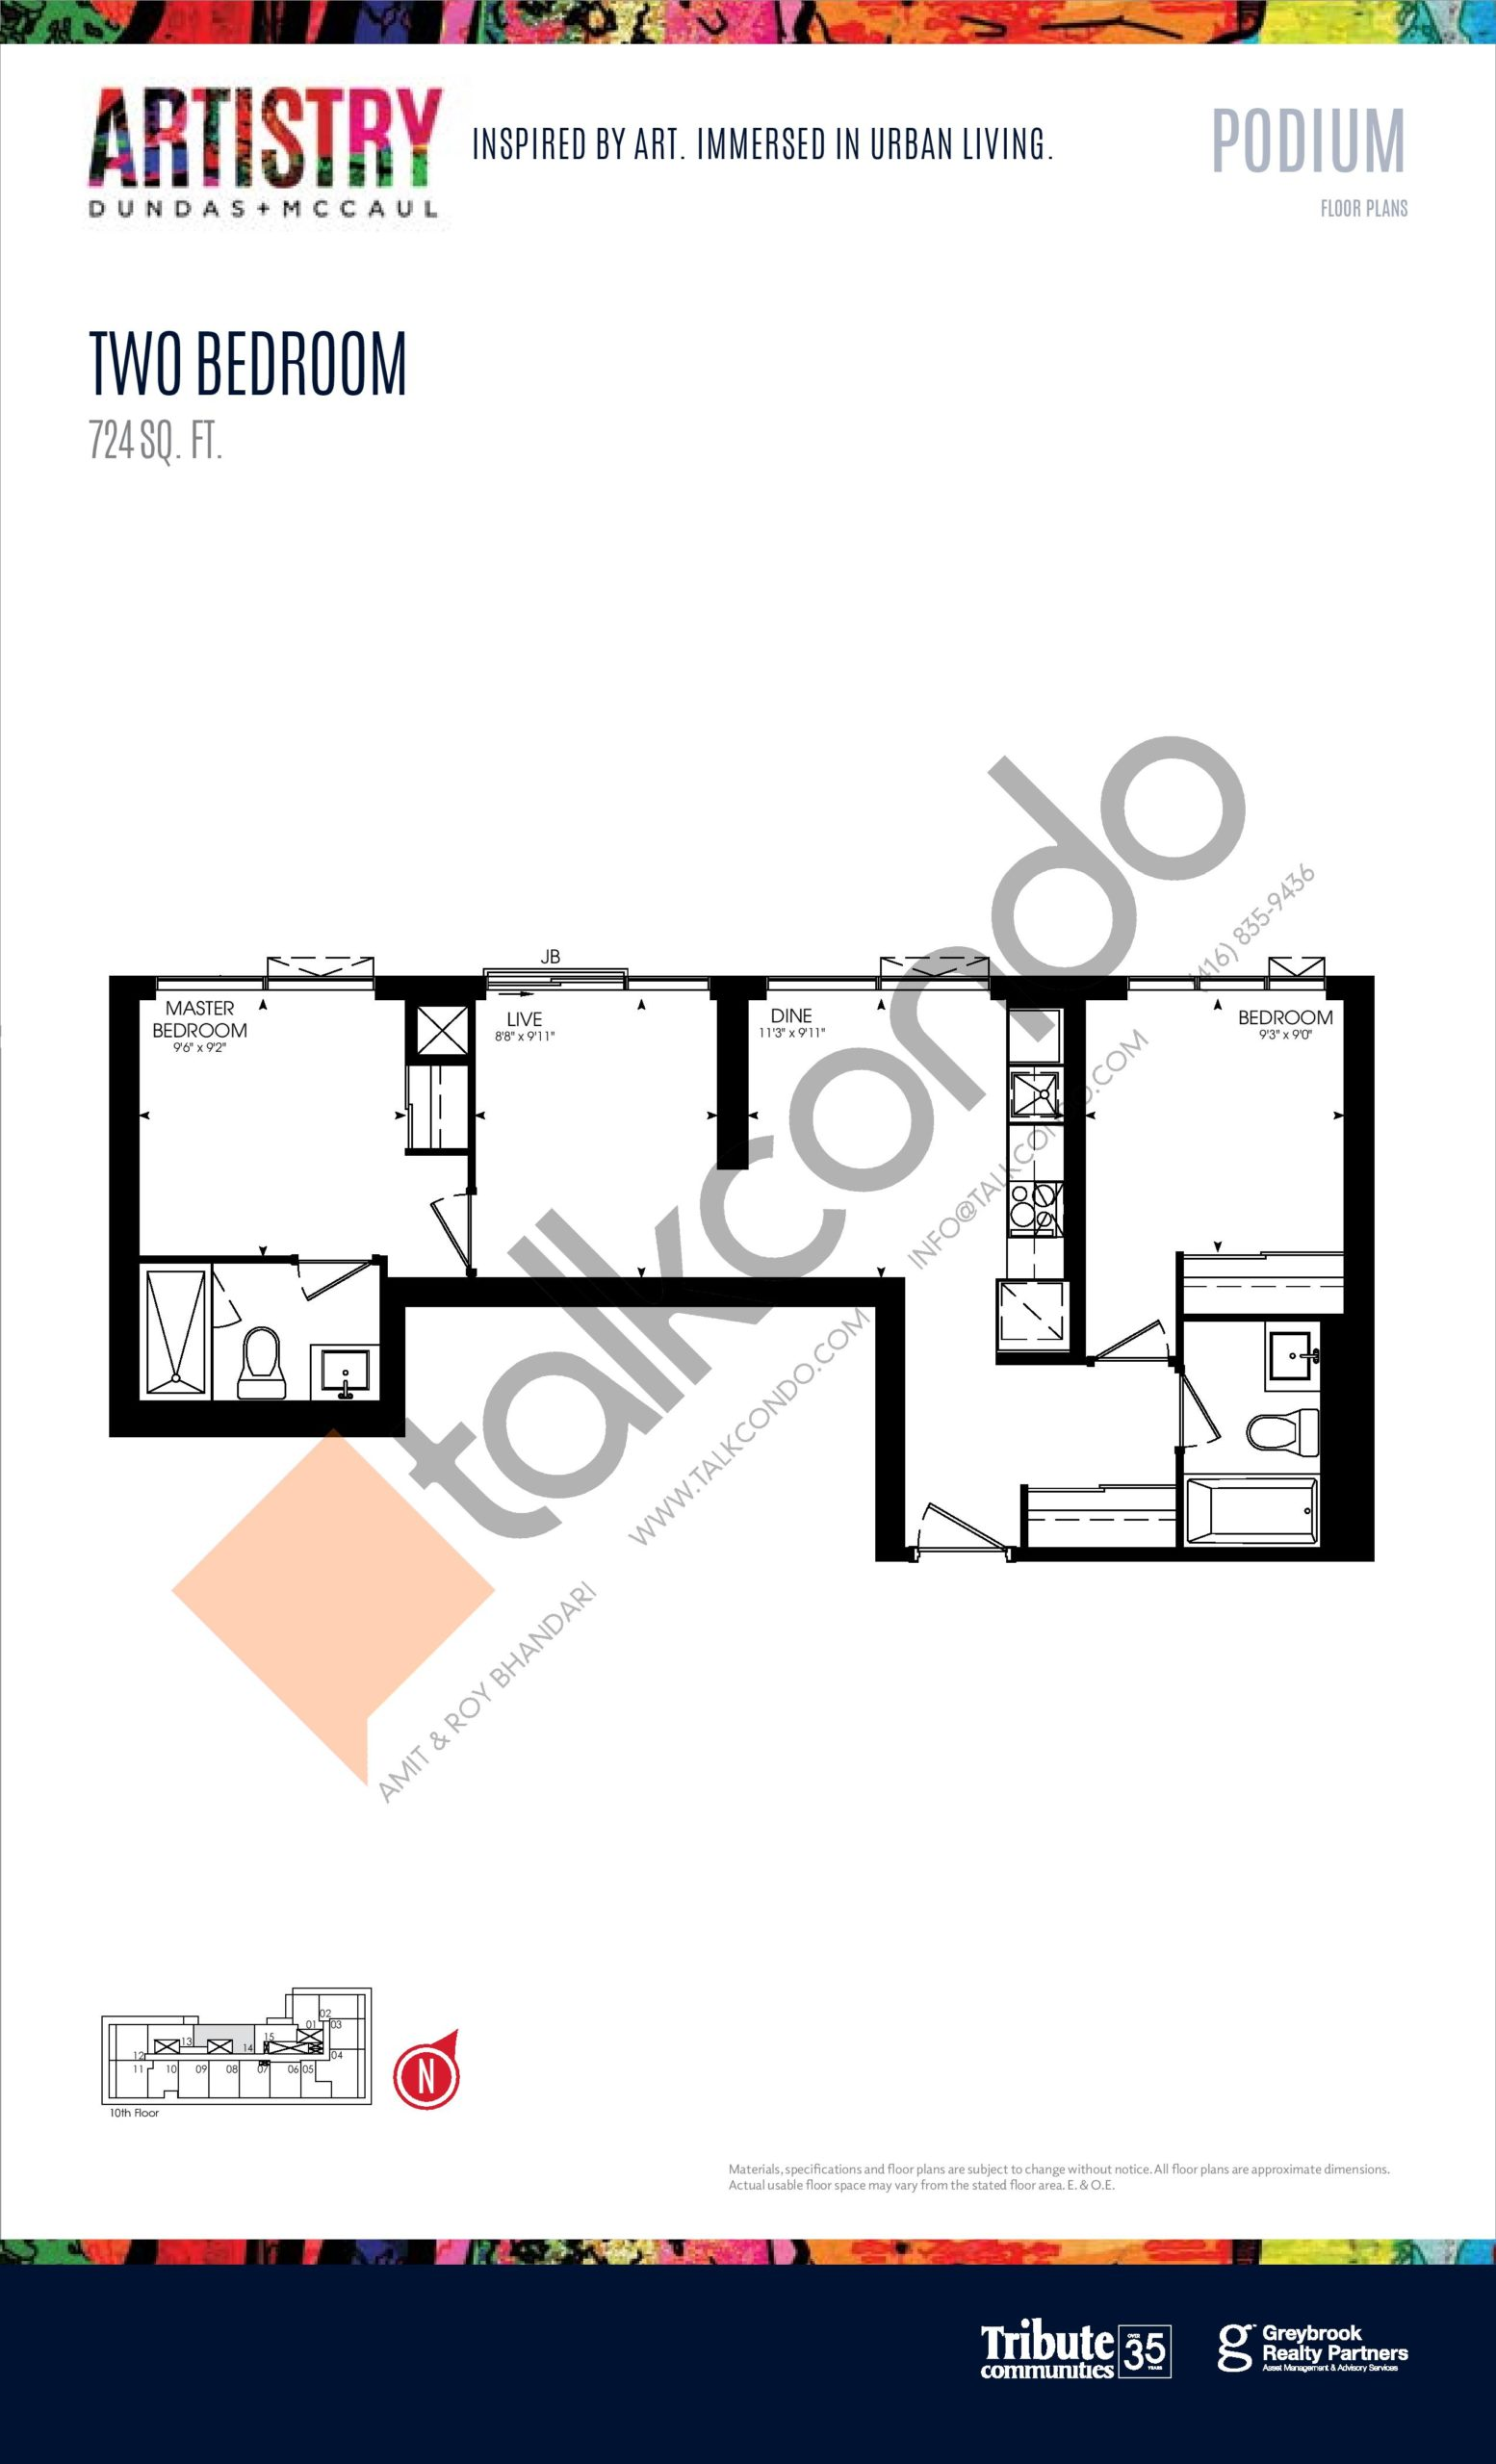 724 sq. ft. - Podium Floor Plan at Artistry Condos - 724 sq.ft